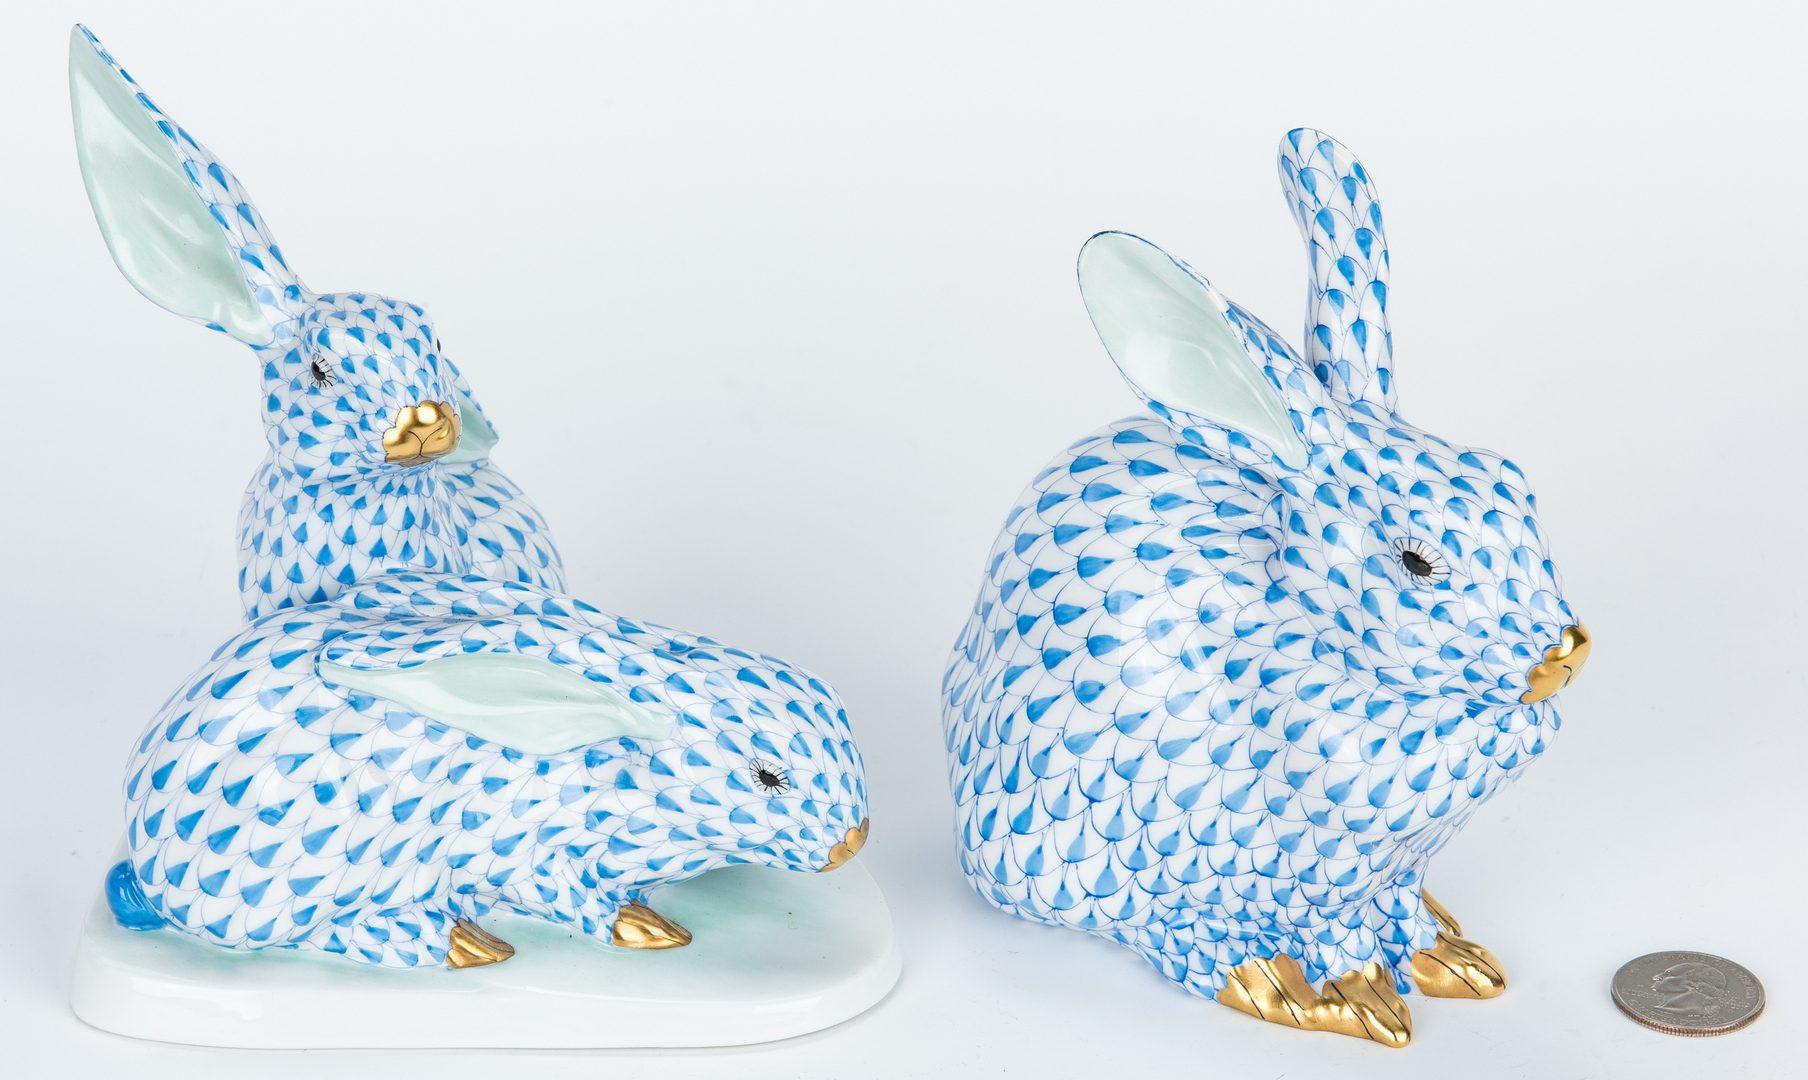 Lot 178: 2 Herend Porcelain Rabbit Figurals